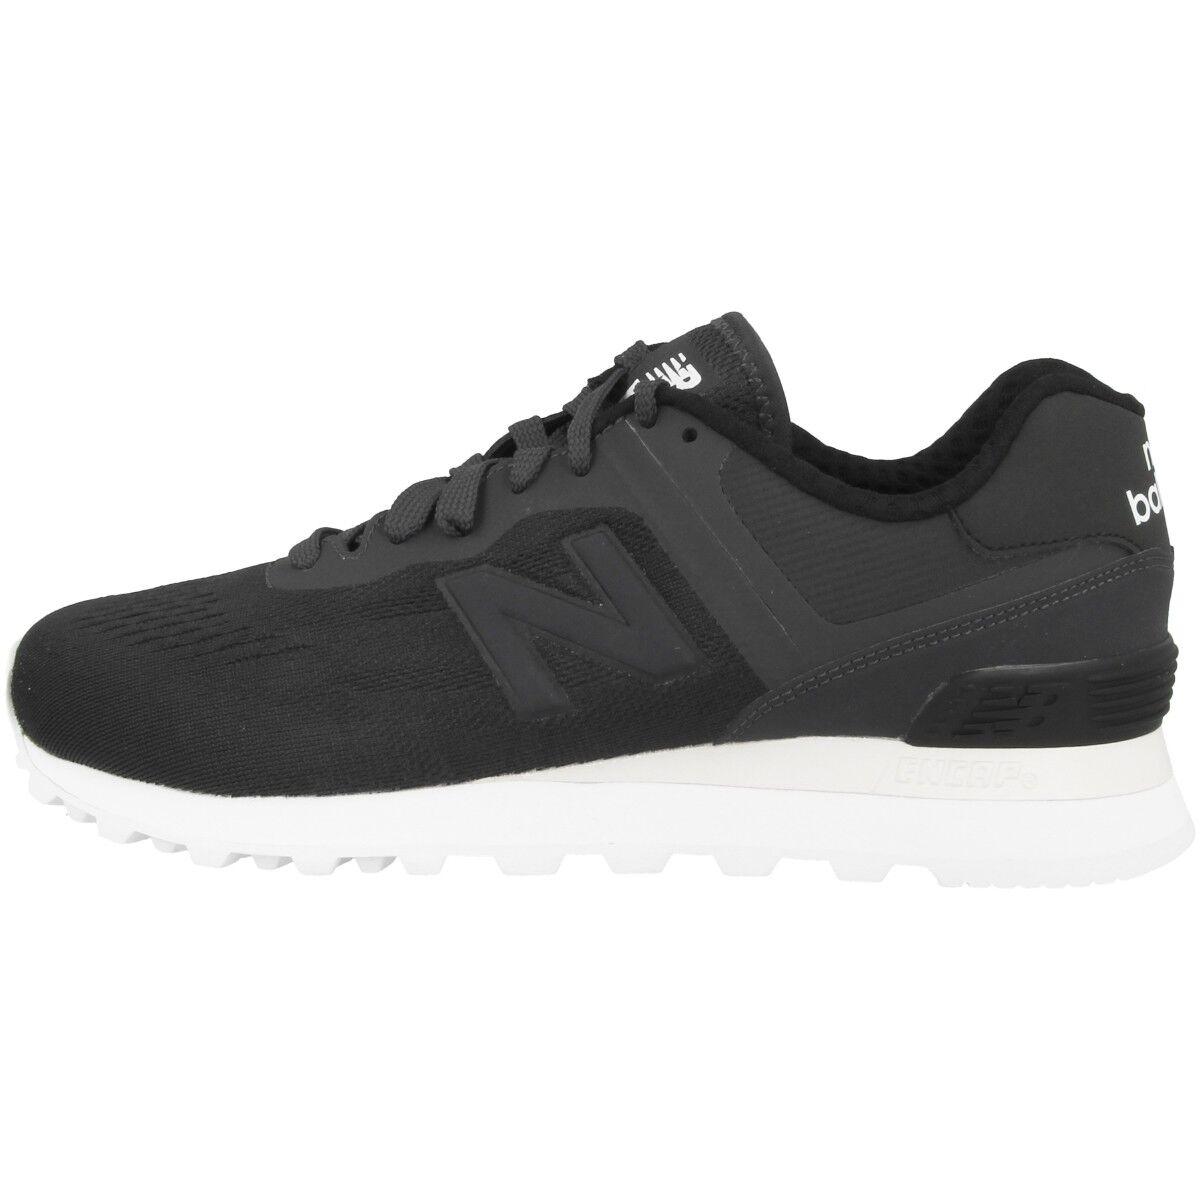 New balance MTL 574 NC zapatos zapatillas negro charcoal mtl574nc ocio m 530 597